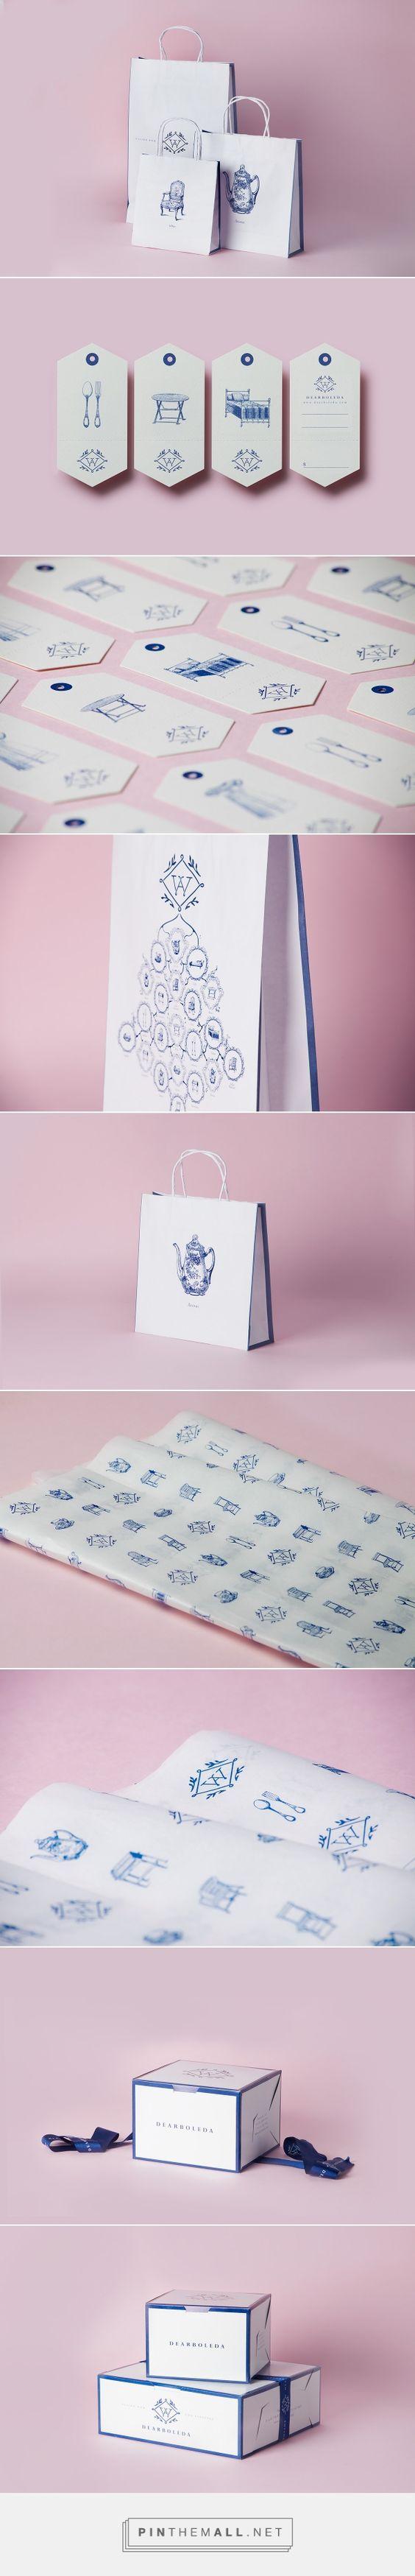 Dearboleda Branding on Behance | Fivestar Branding – Design and Branding Agency & Inspiration Gallery